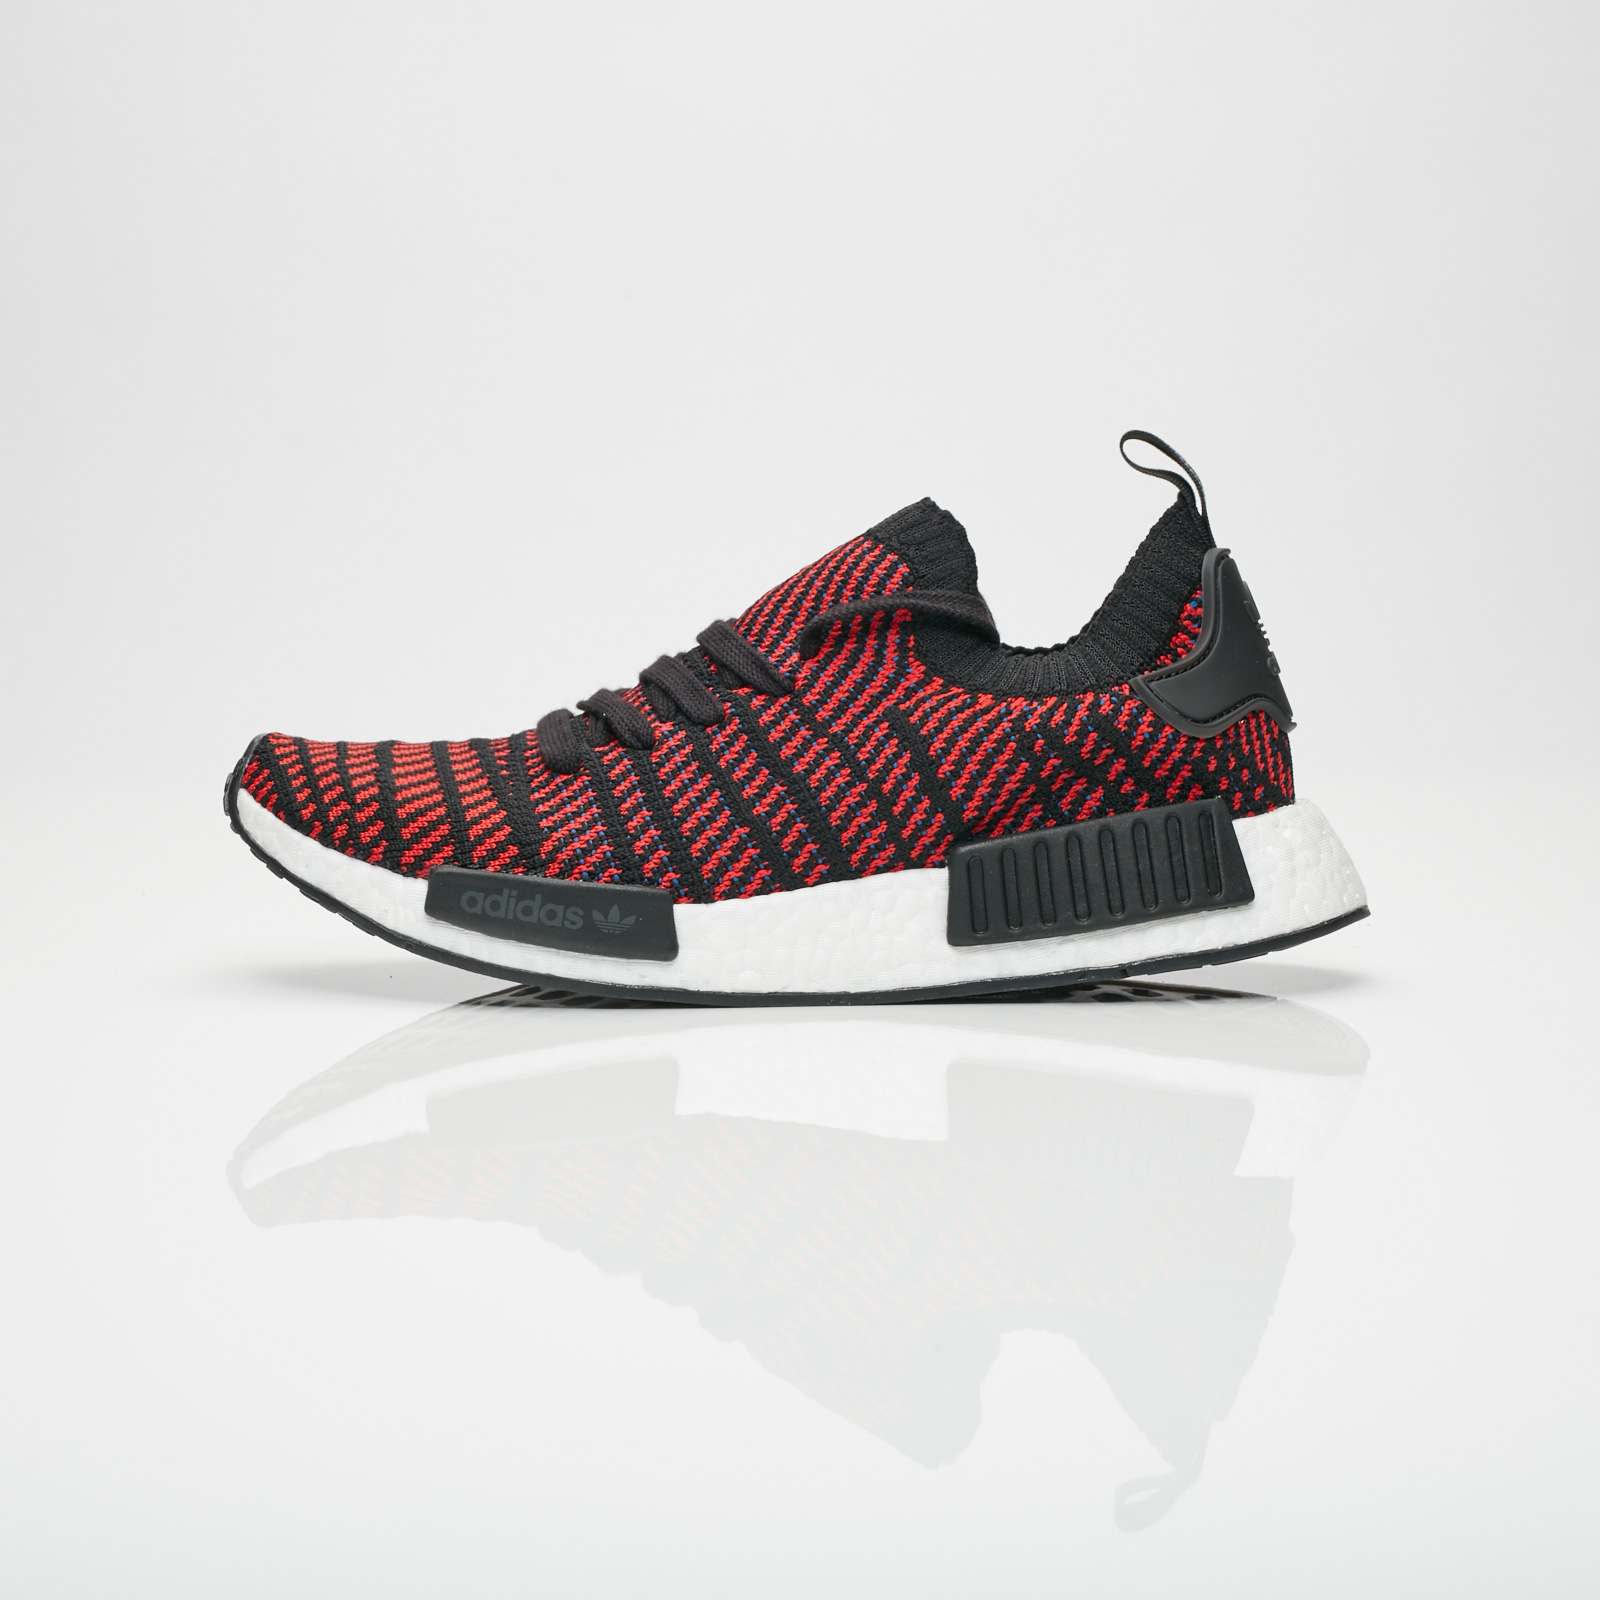 8b6de64e0cf95 adidas NMD R1 STLT PK - Cq2385 - Sneakersnstuff